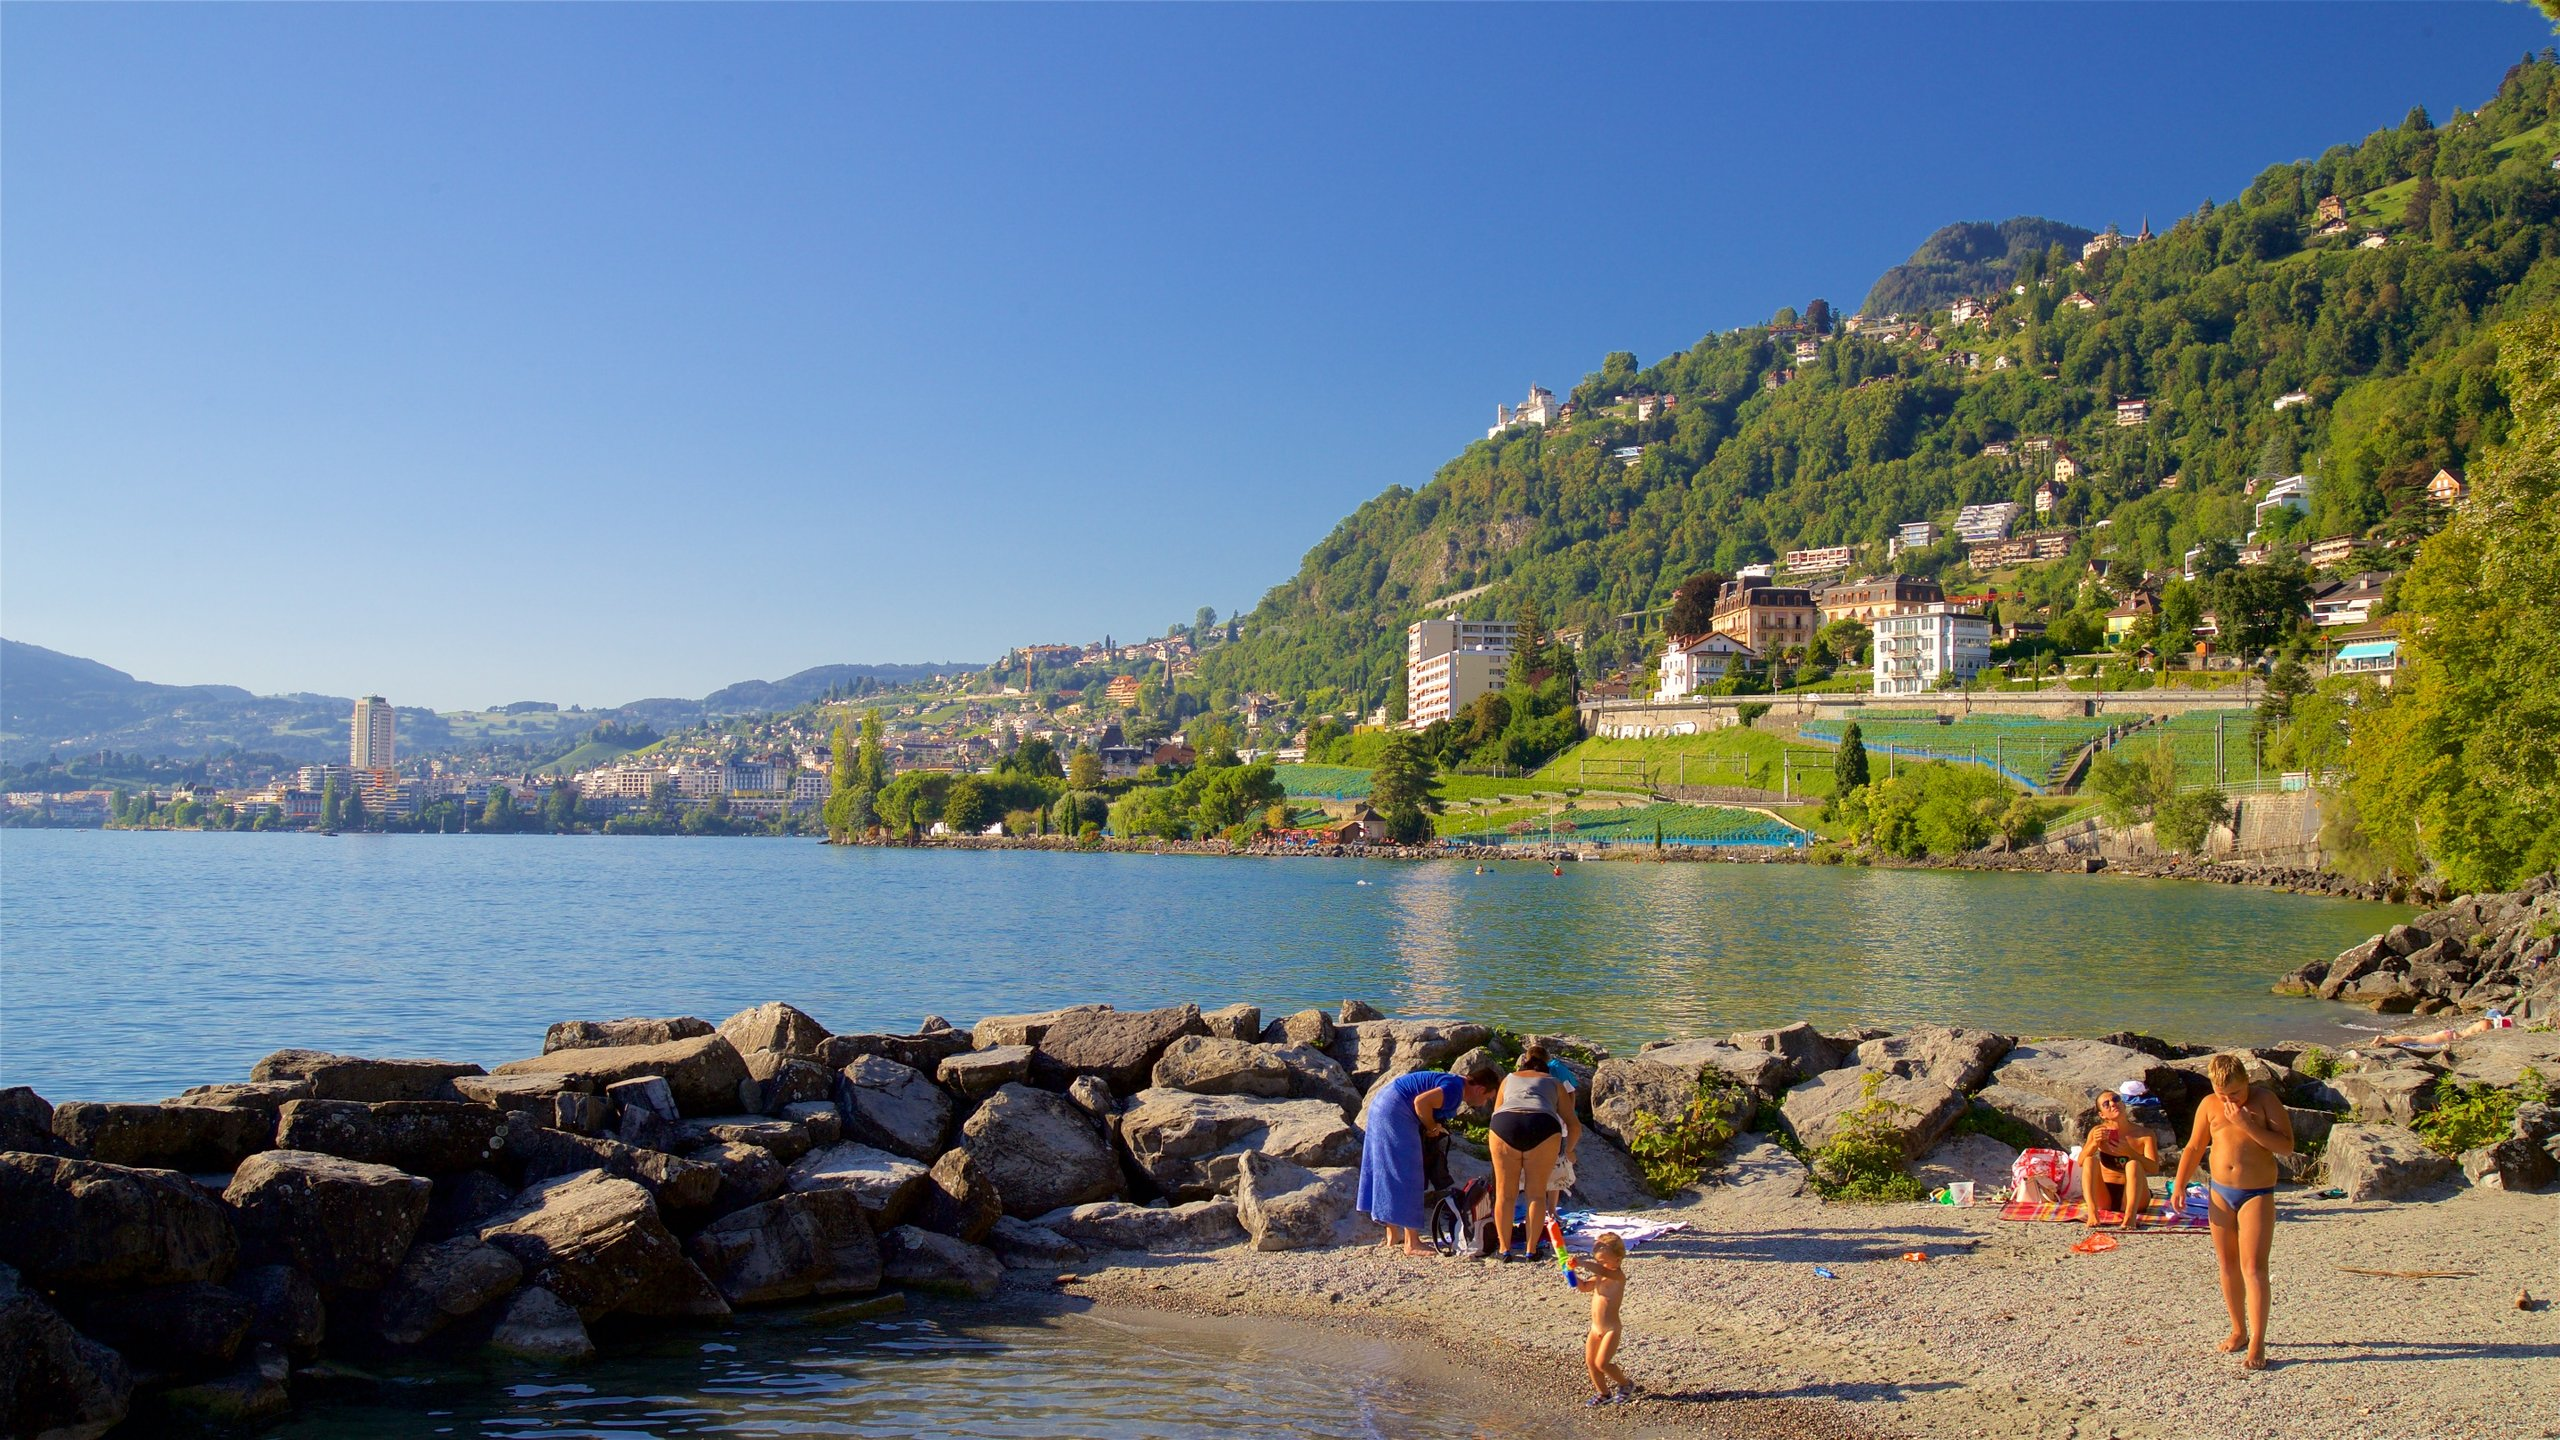 Montreux, Canton of Vaud, Switzerland